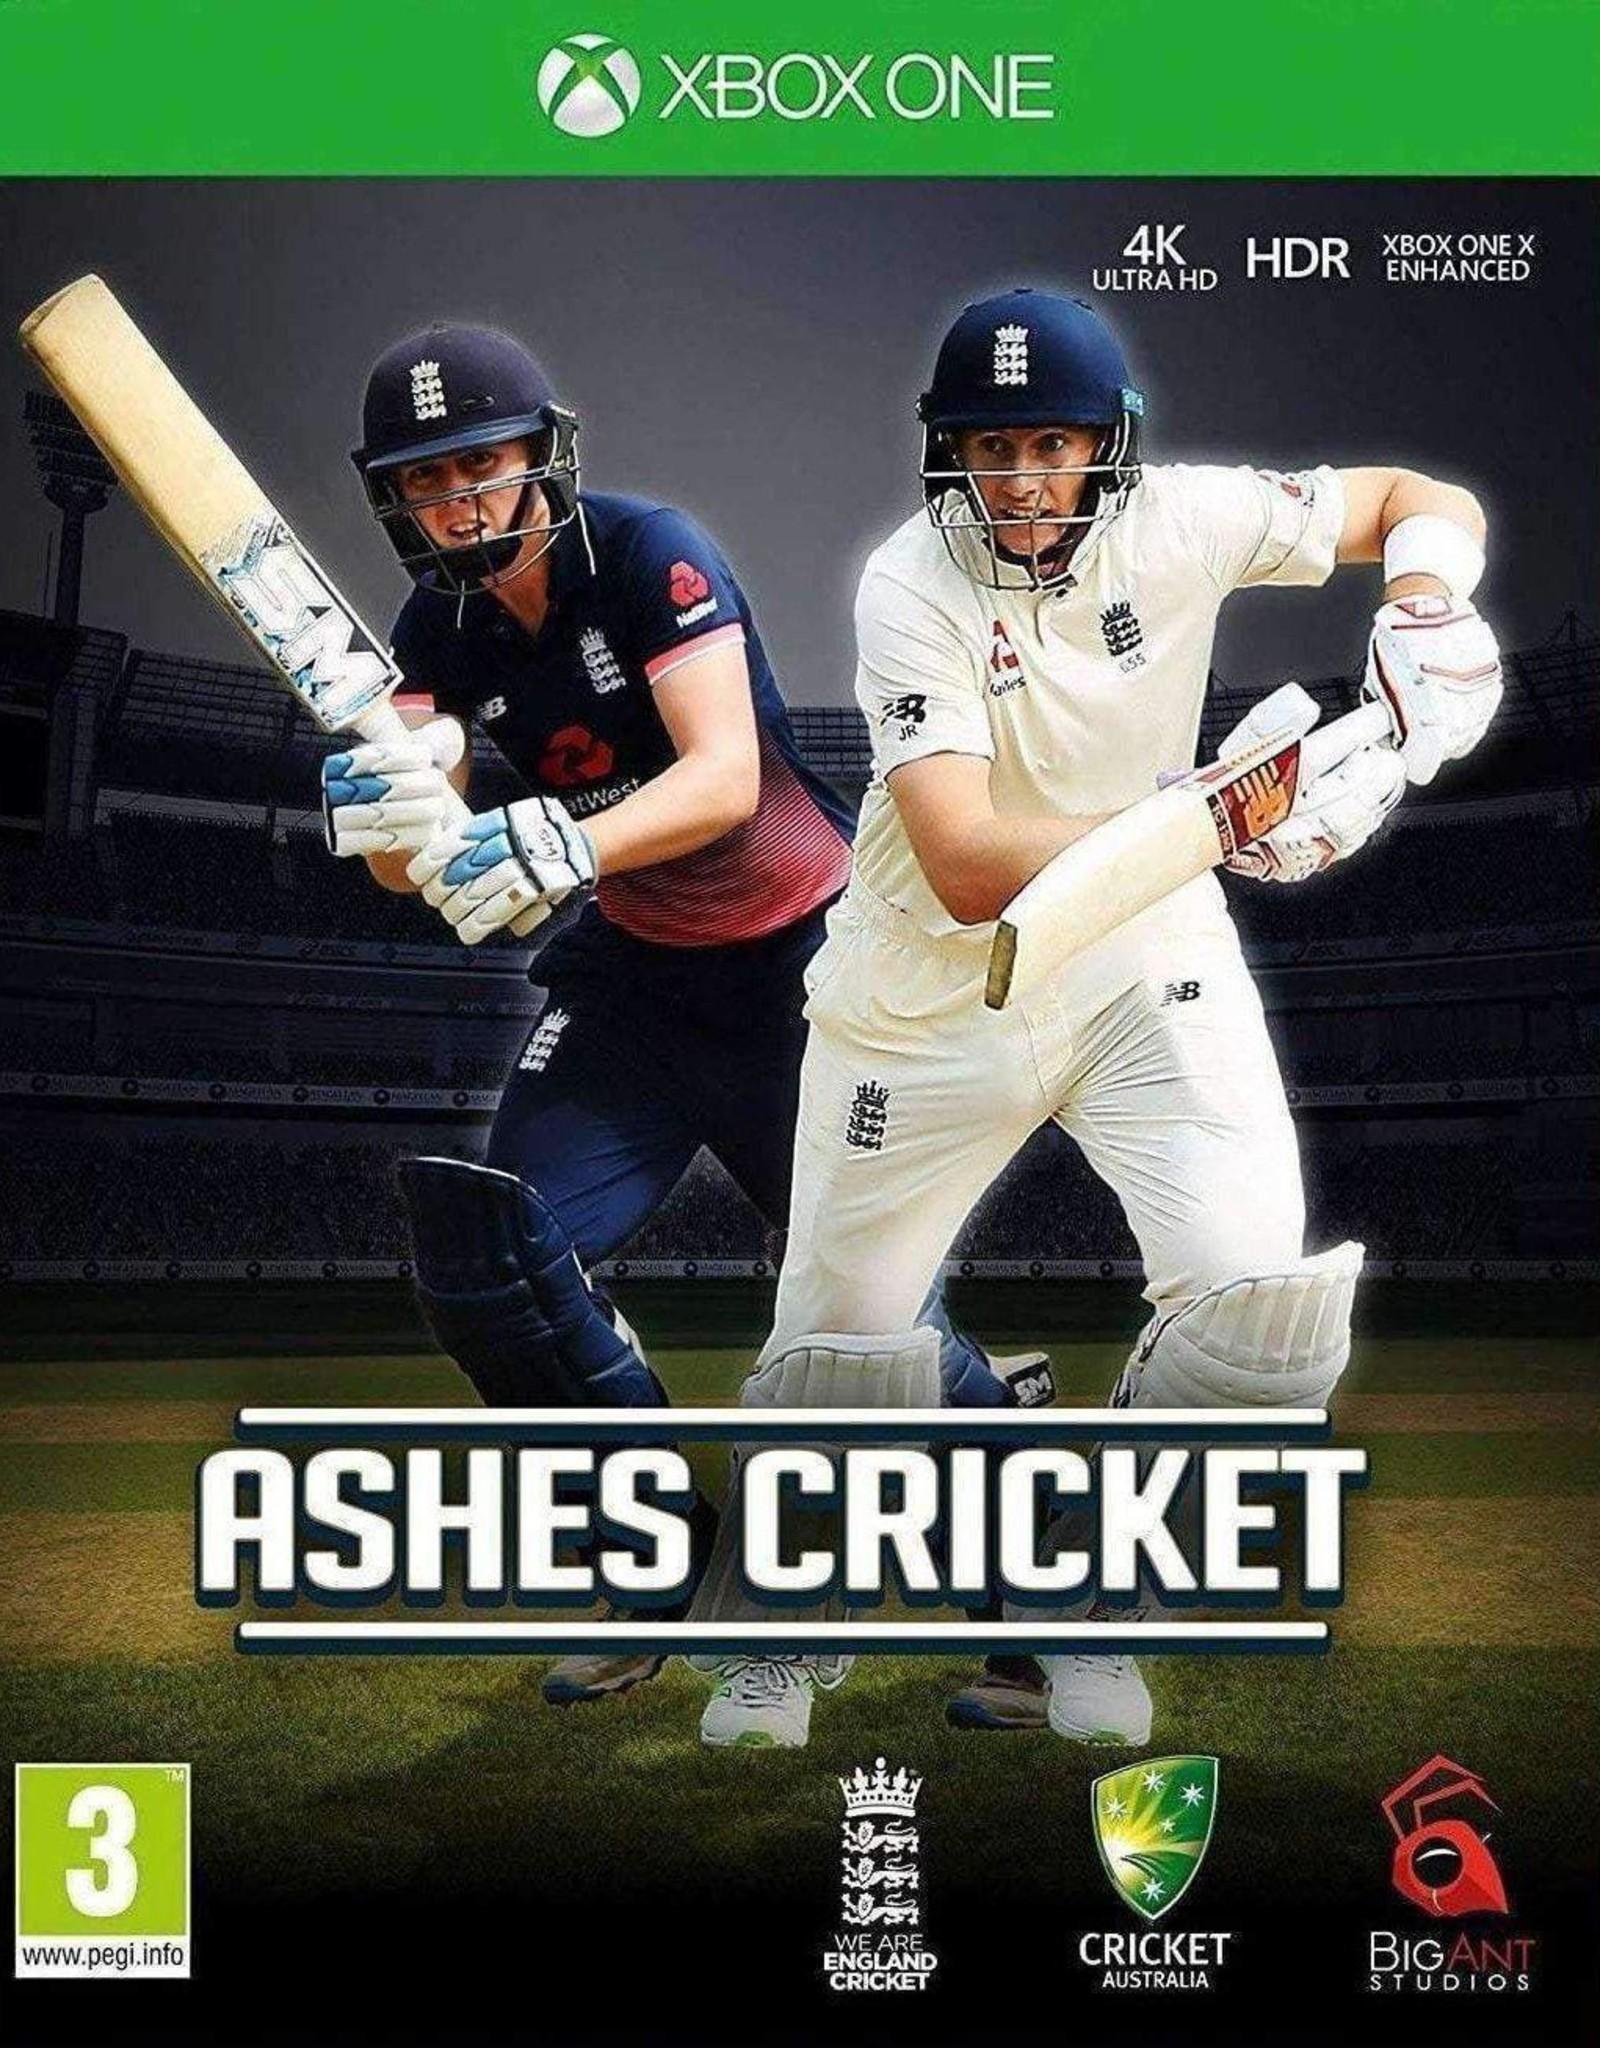 Ashes Cricket - XBOne NEW